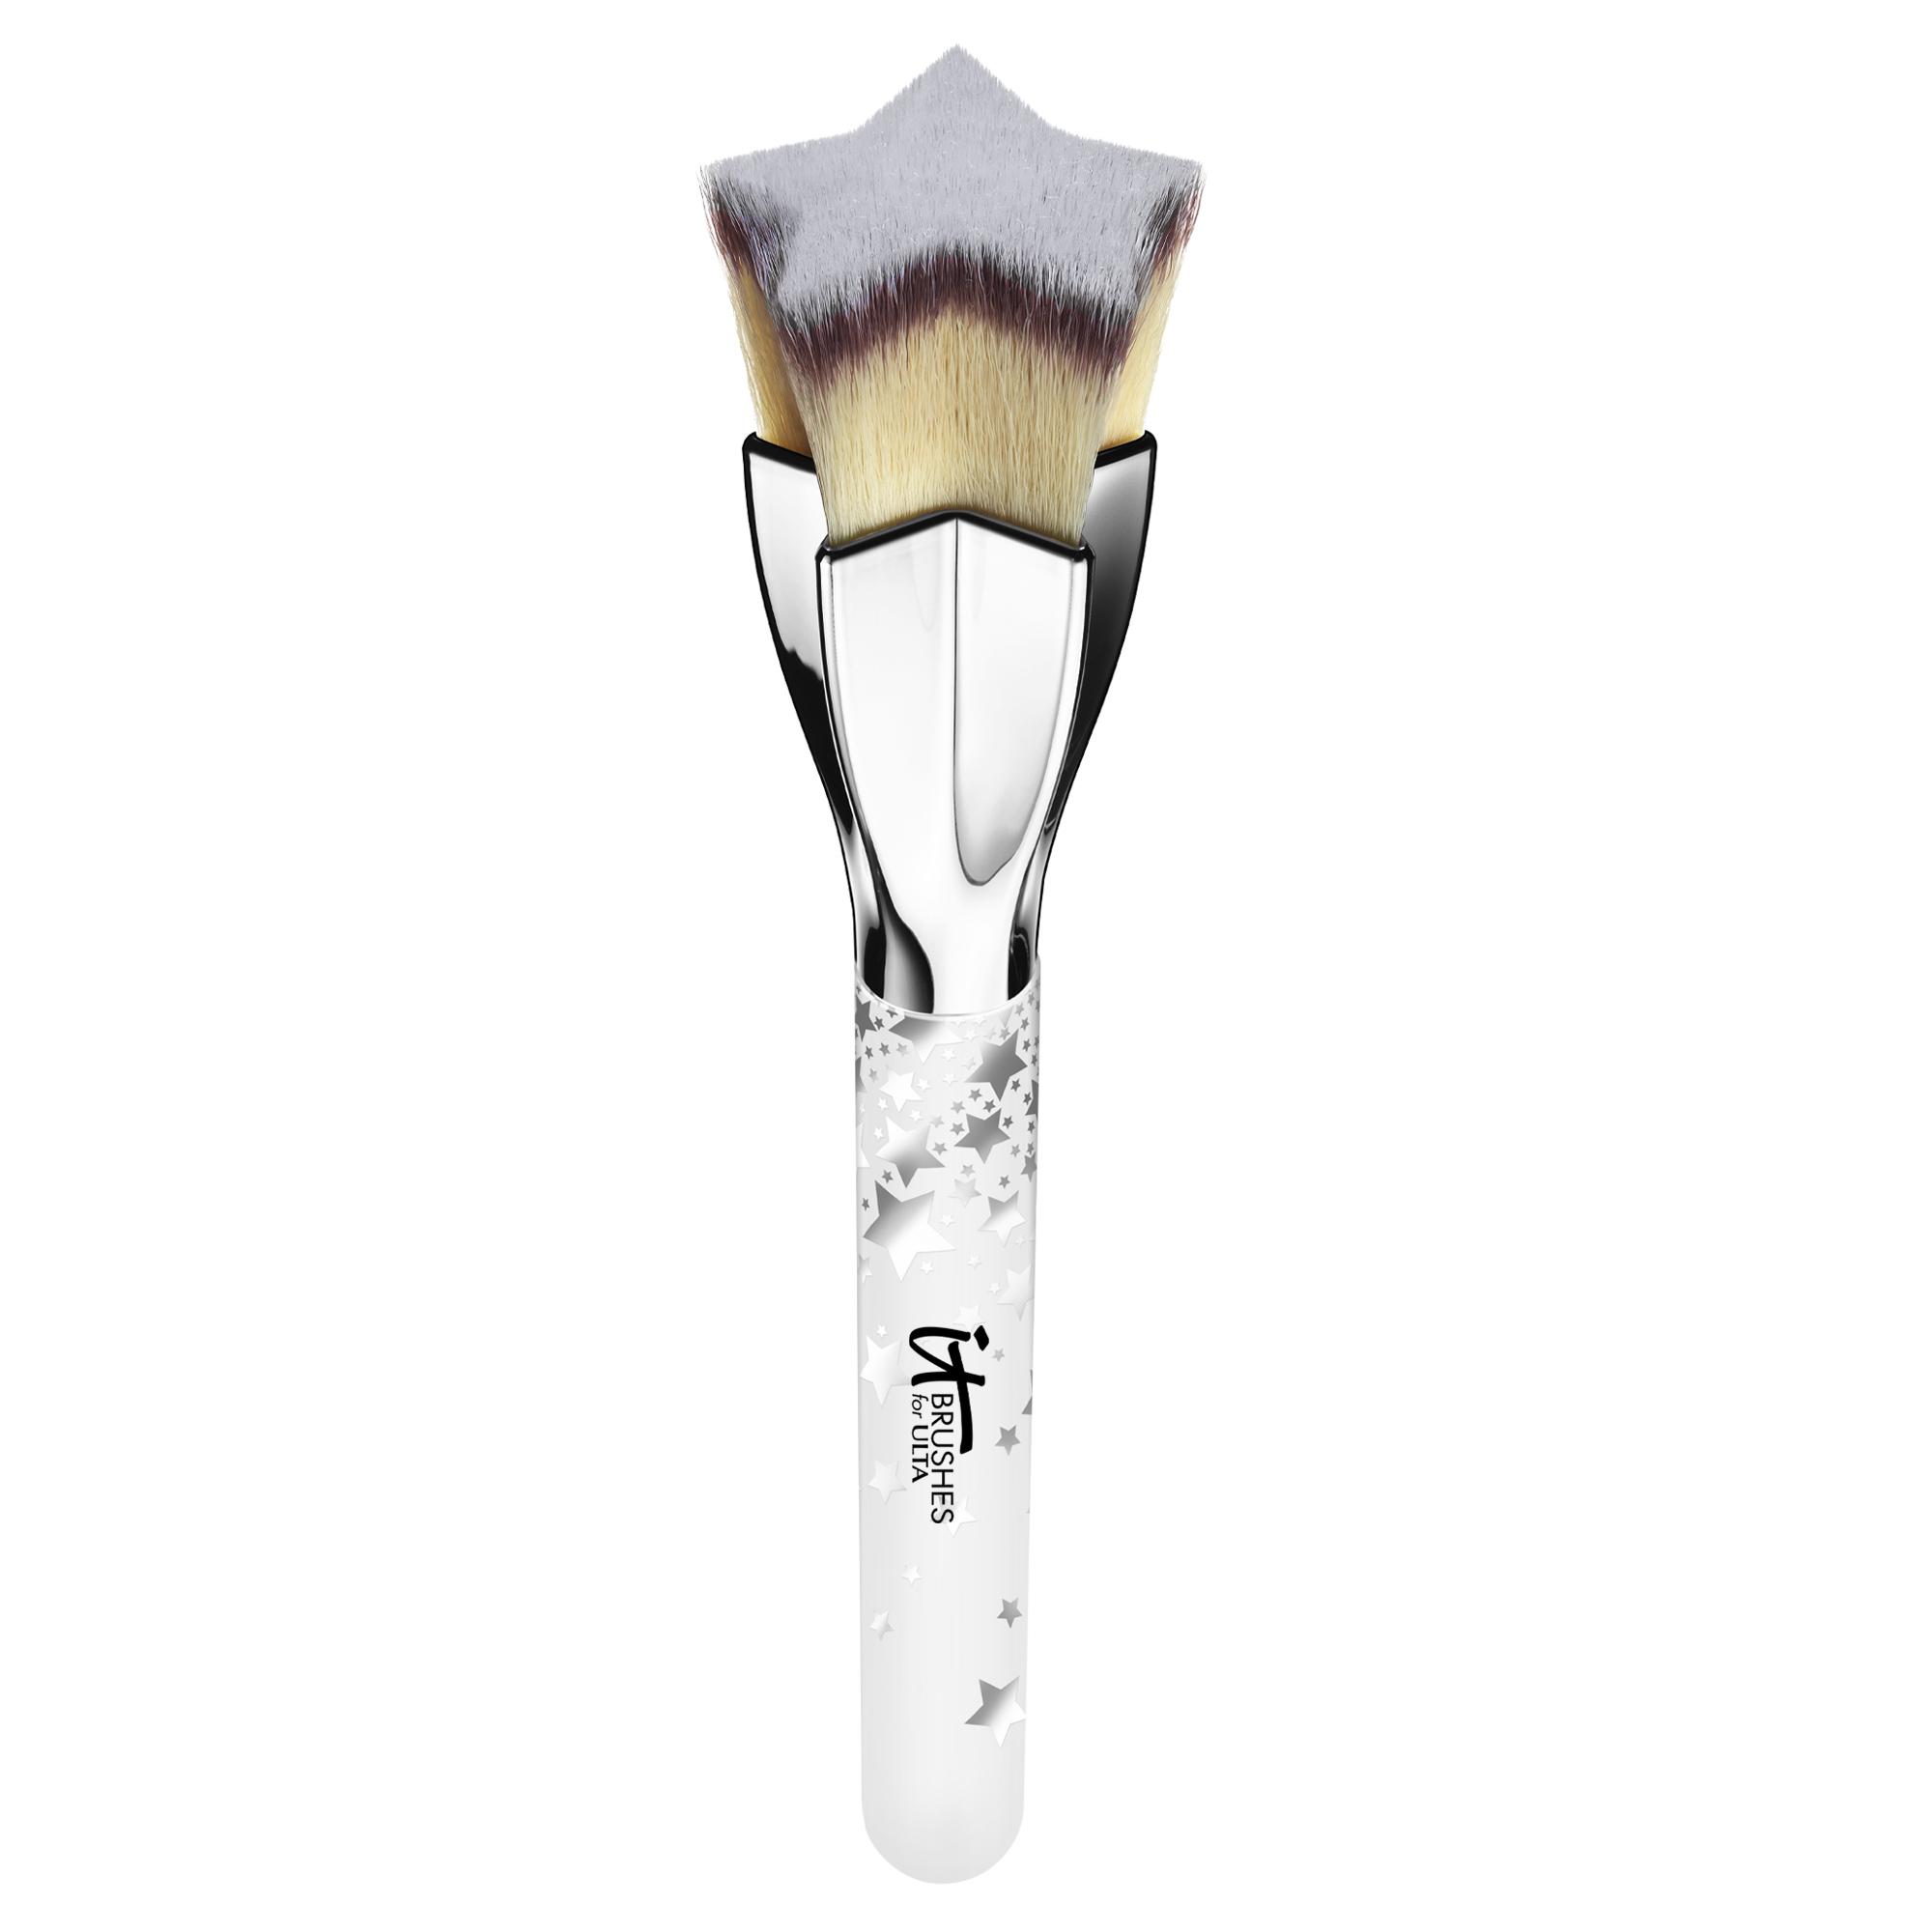 Superstar Flawless Foundation Brush - IT Cosmetics